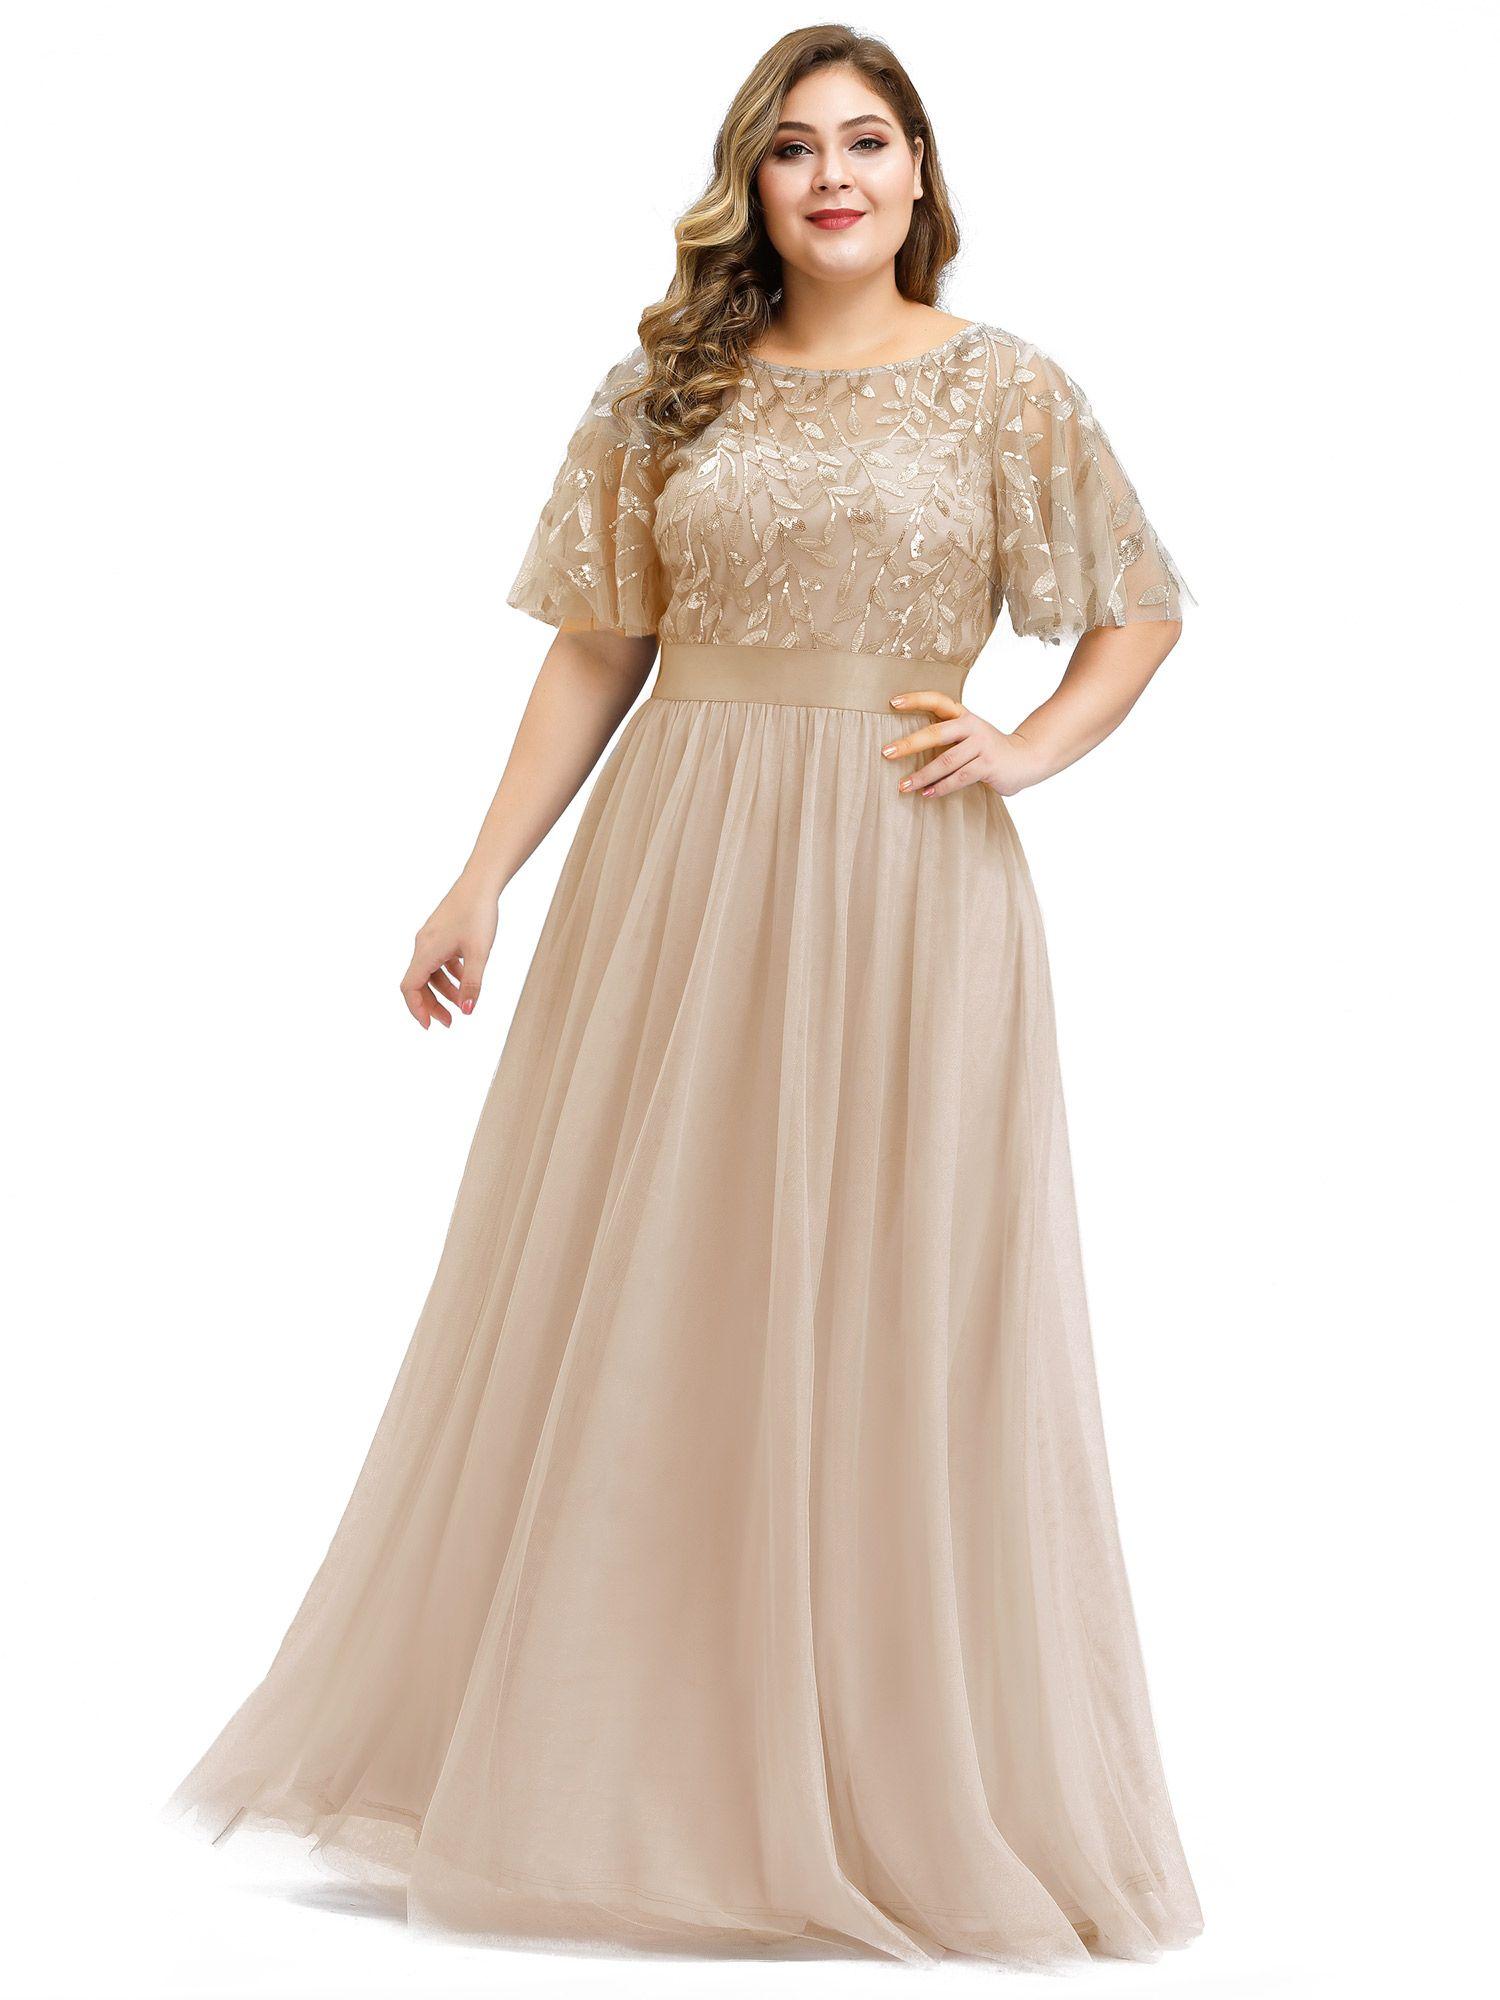 Ever Pretty Ever Pretty Womens Embroidered Wedding Party Dresses For Women 09042 Gold Us8 Walmart Com Elegant Bridesmaid Dresses Beautiful Evening Dresses Plus Size Prom Dresses [ 2000 x 1500 Pixel ]